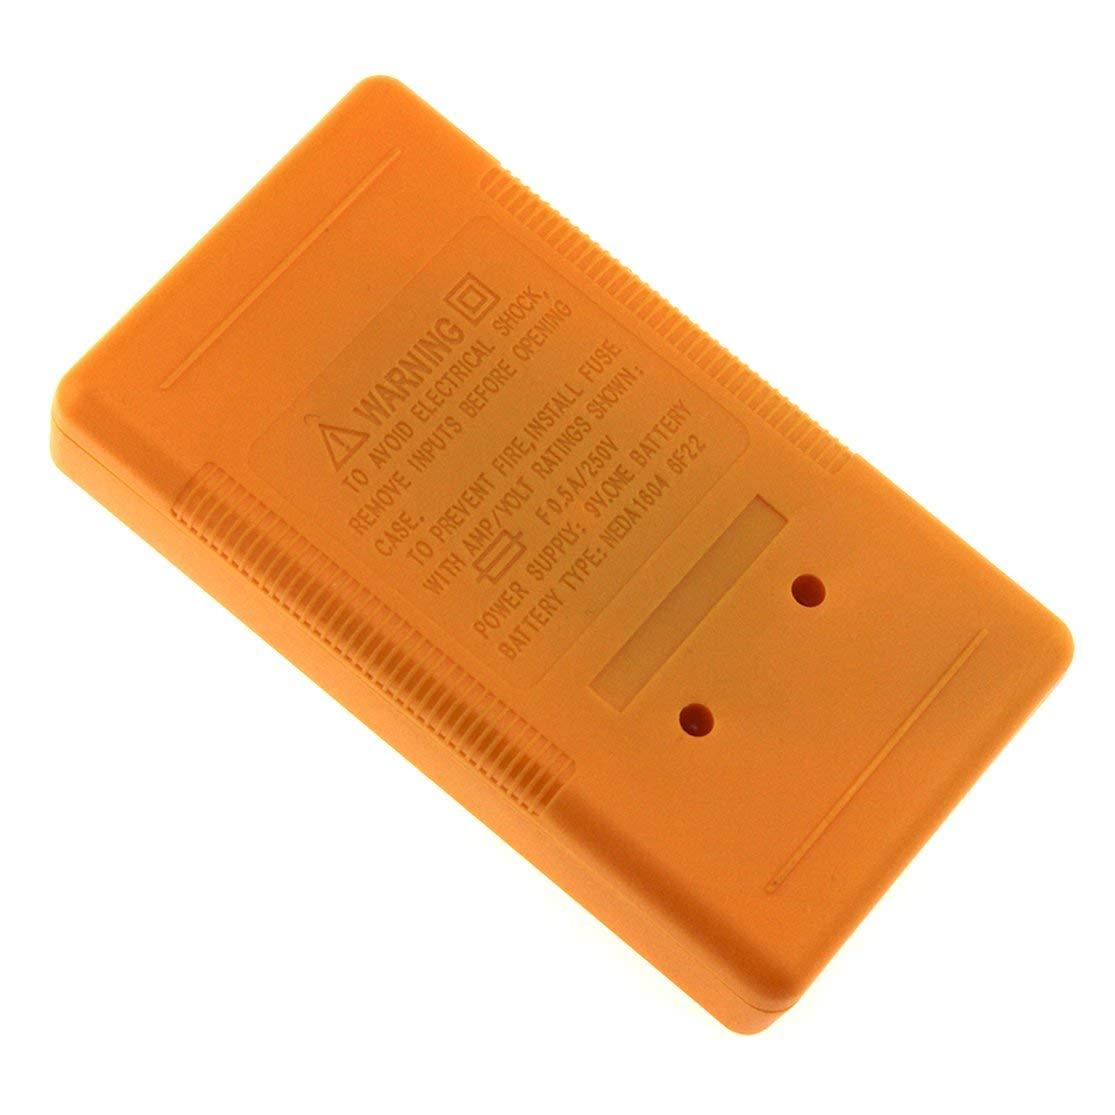 Kaemma DT-830B Mini Pocket Digital Multimeter 1999 Counts AC//DC Volt Amp Ohm Diode hFE Tester Ammeter Voltmeter Ohmmeter Color:Yellow